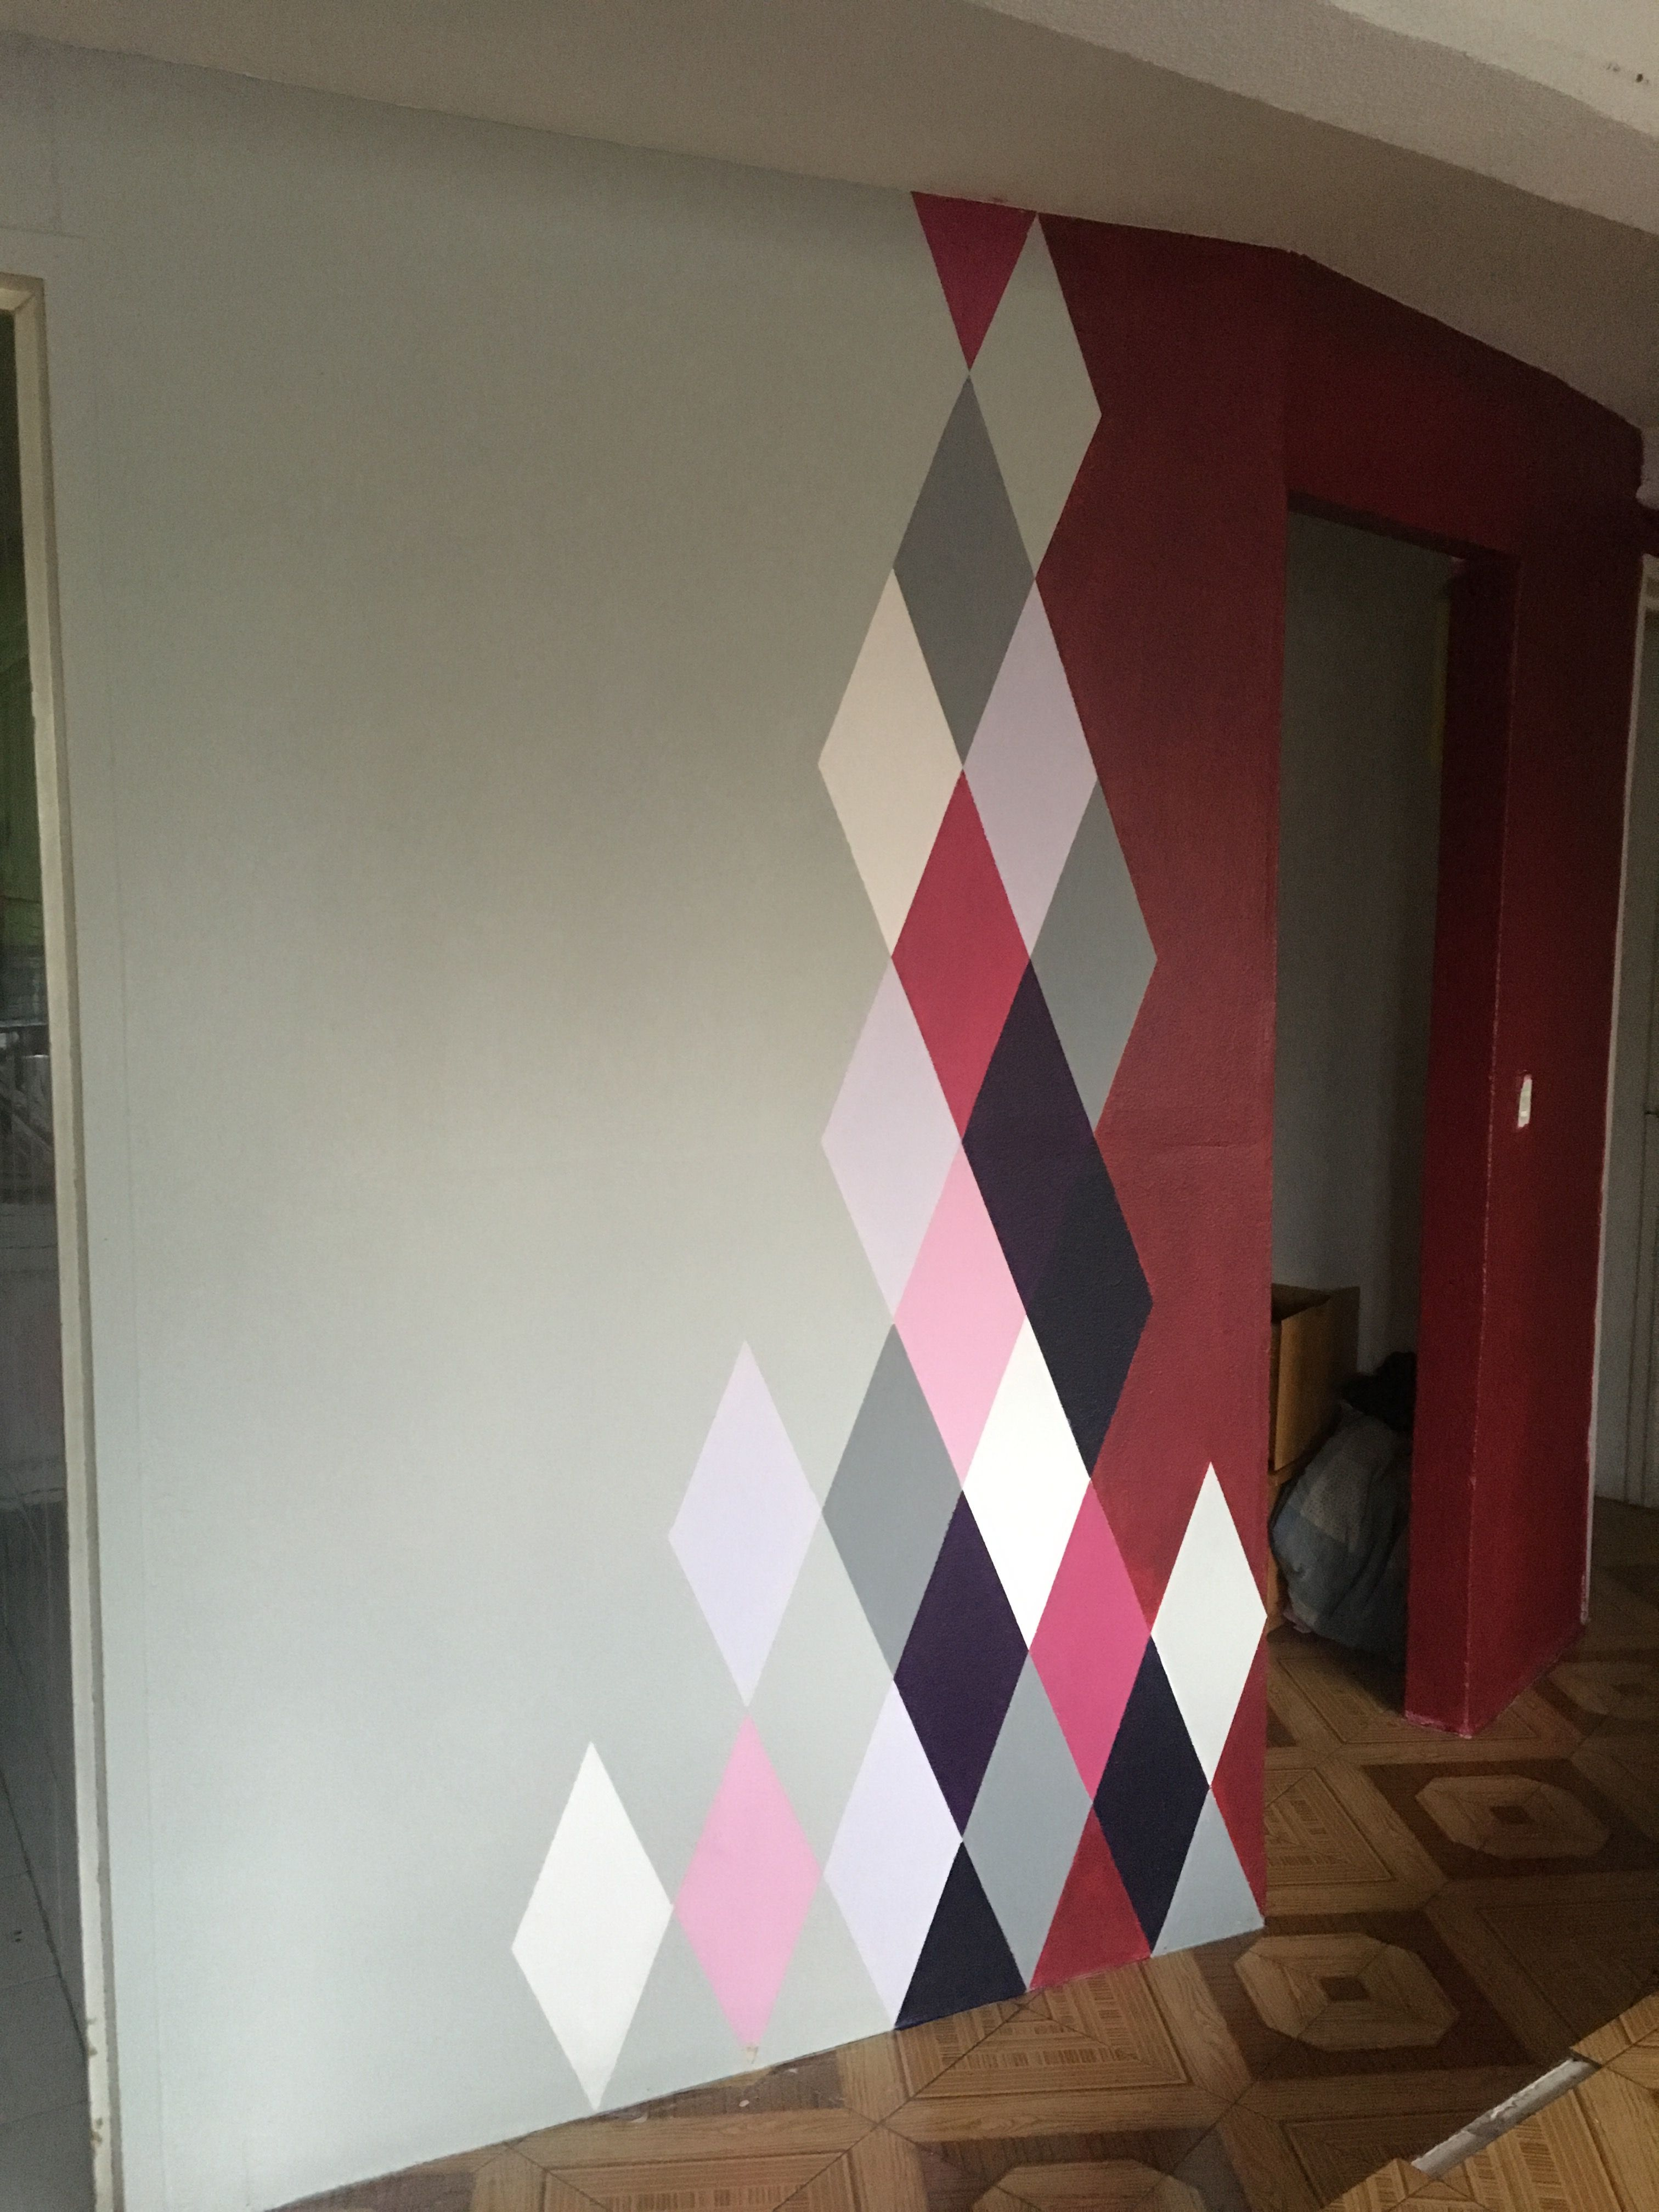 Acabado Perfecto Diy Wall Painting Geometric Wall Paint Room Wall Painting